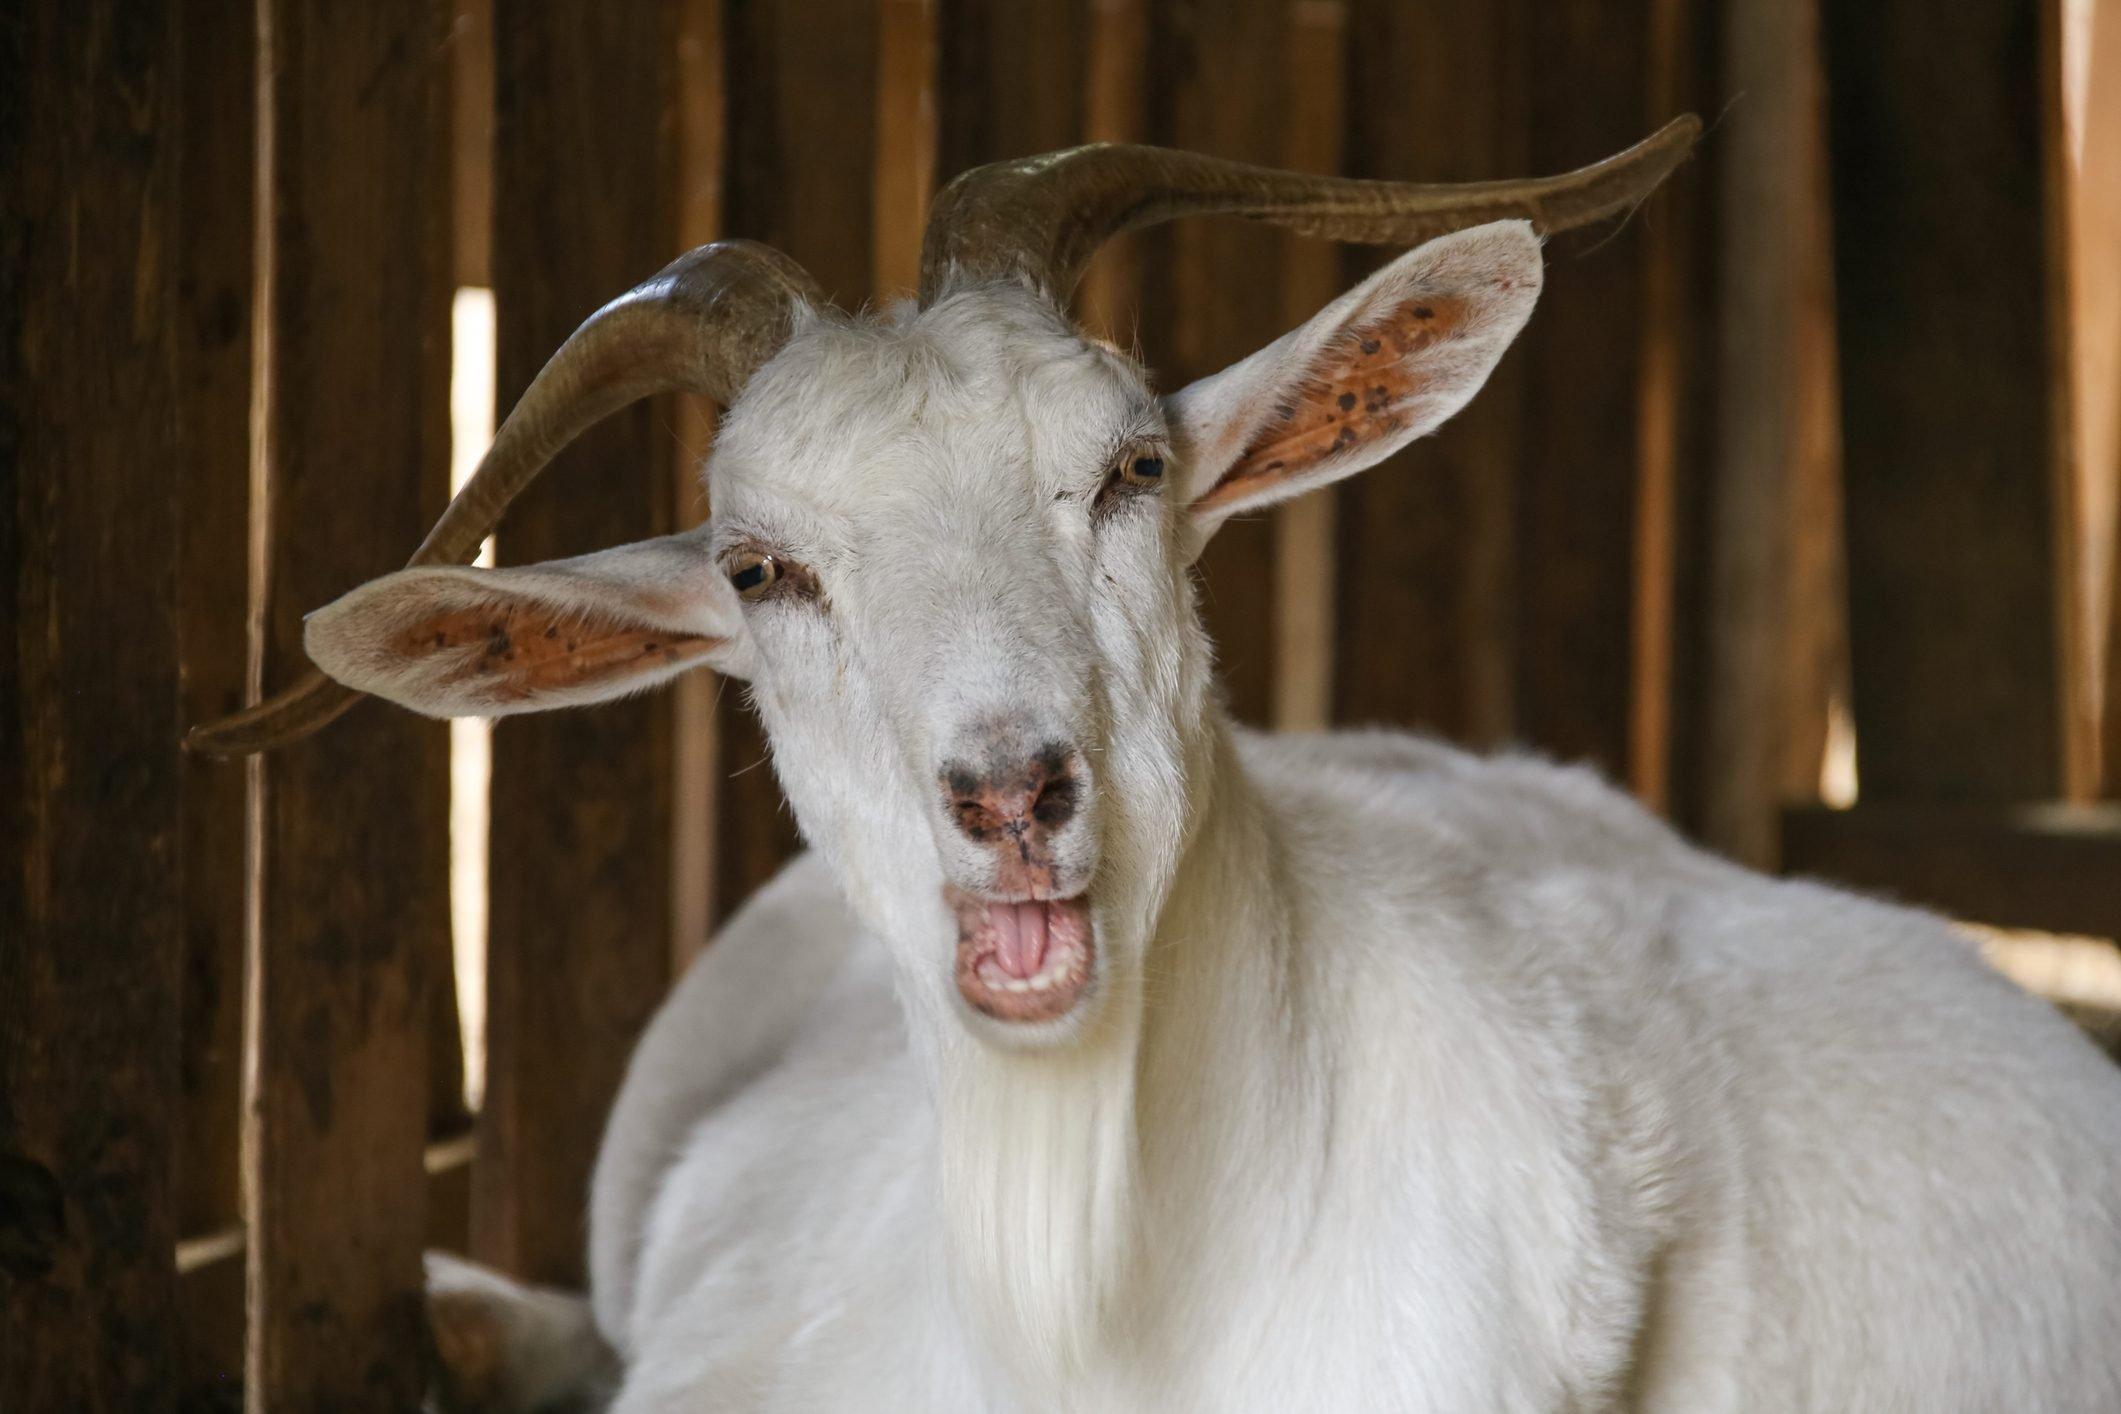 Talking goat